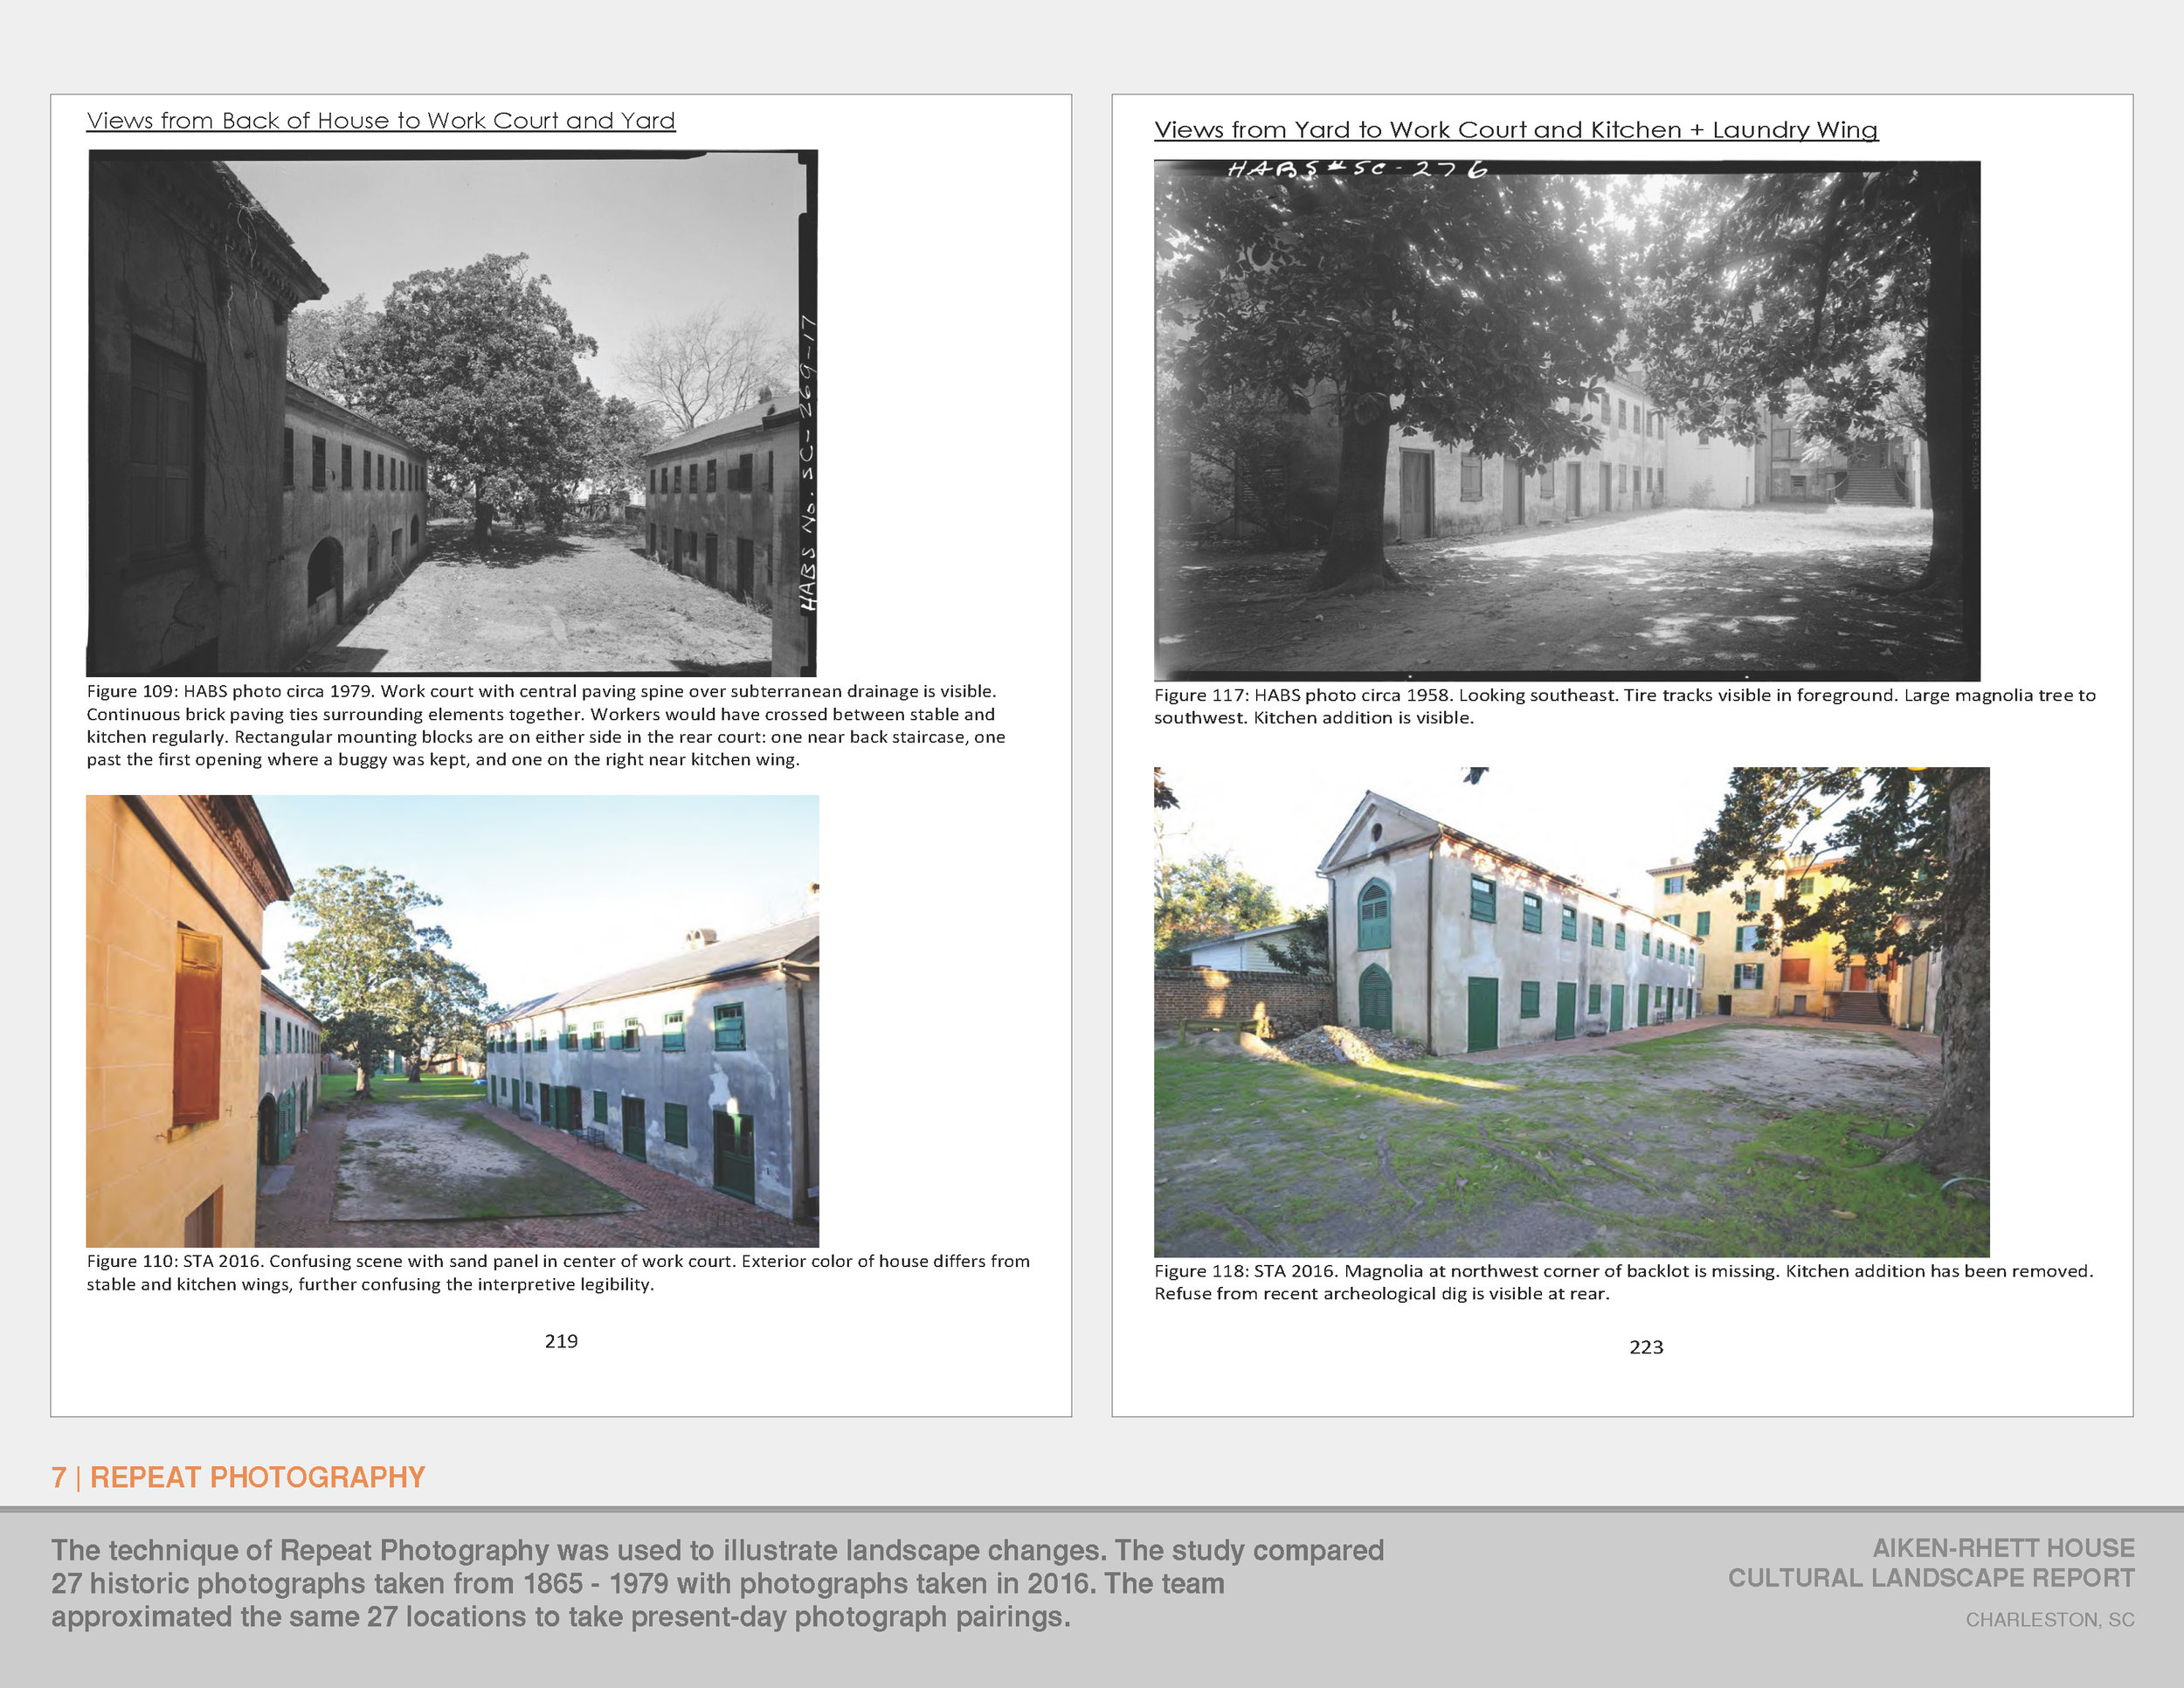 Suzanne Turner Associates - Aiken-Rhett House Report_Page_07.jpg